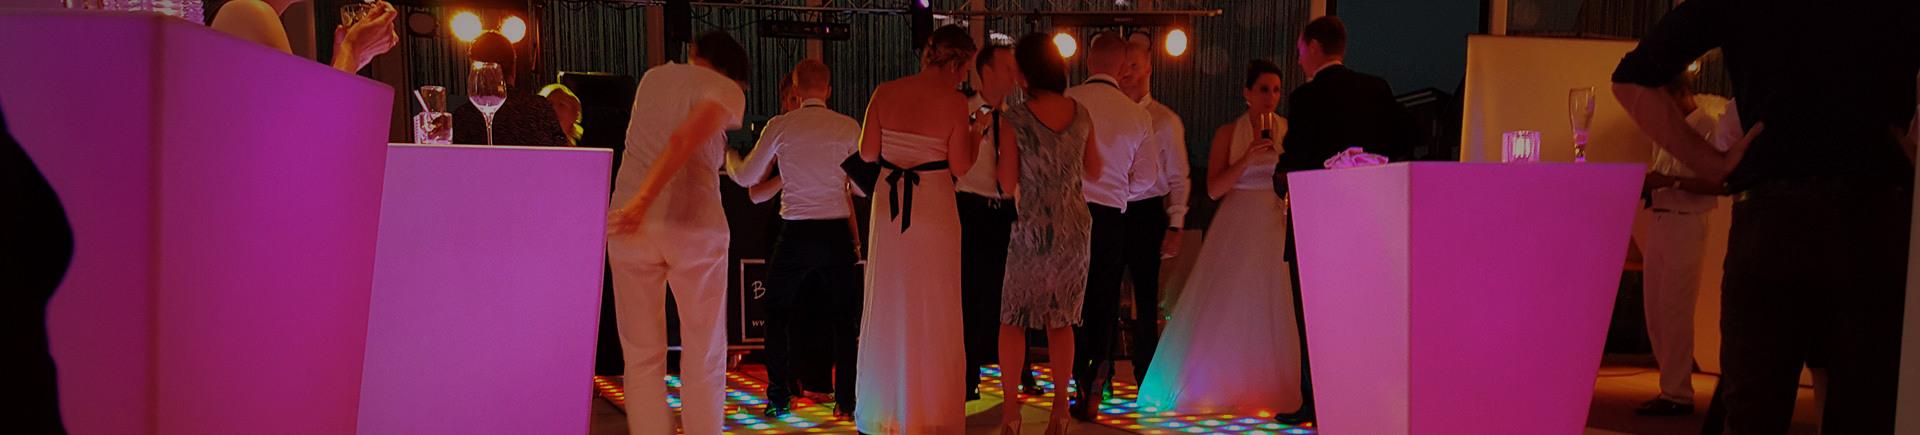 bruiloft-dj-venlo-limburg